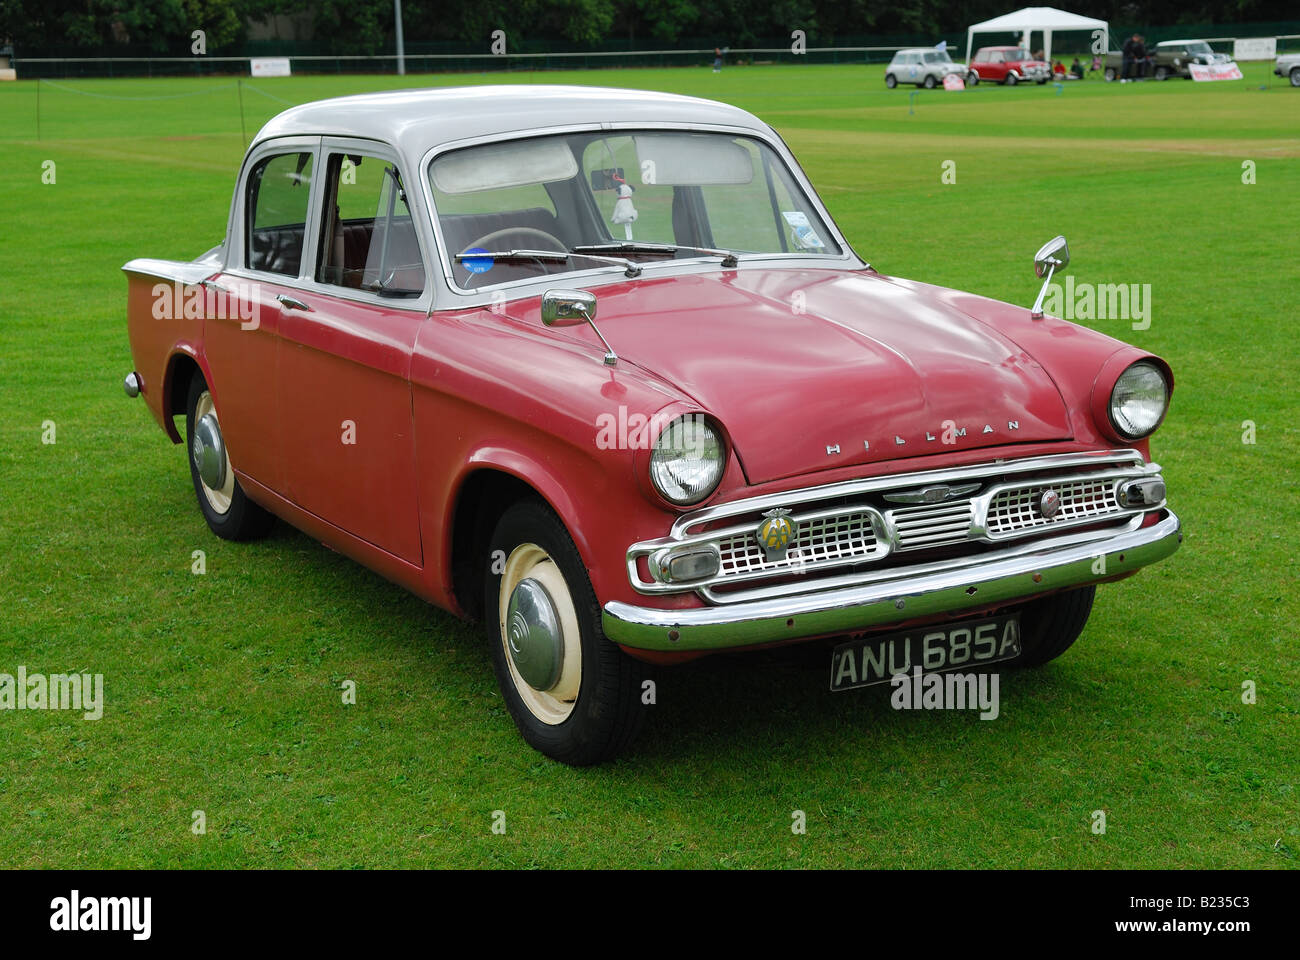 Norfolk Classic Cars